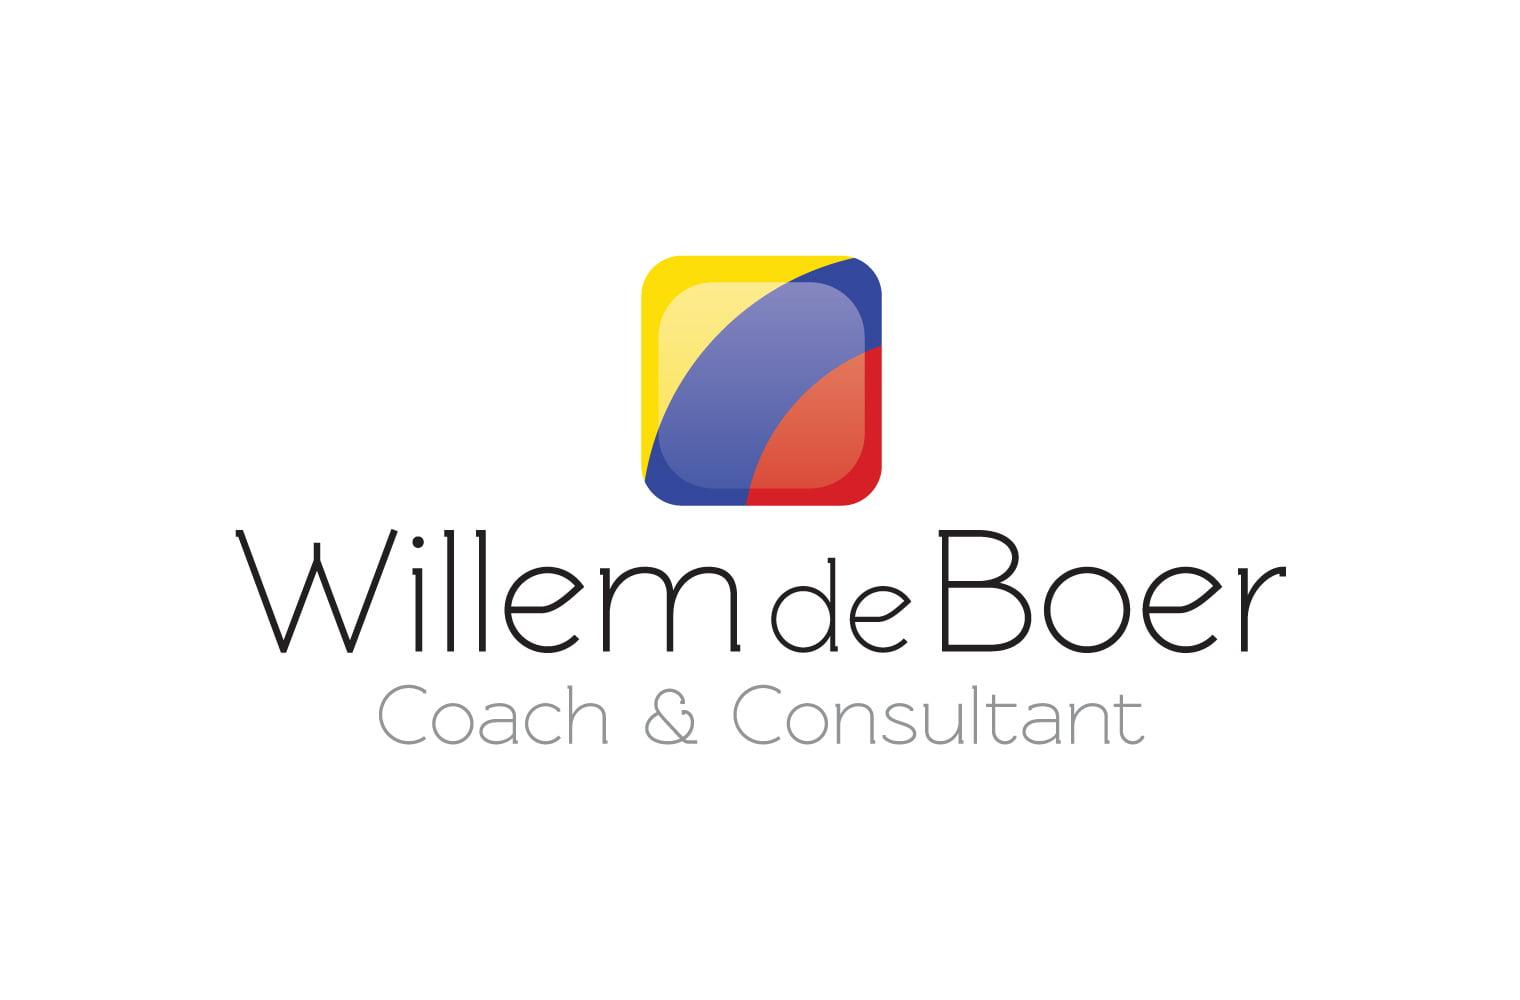 Logo Willem de Boer